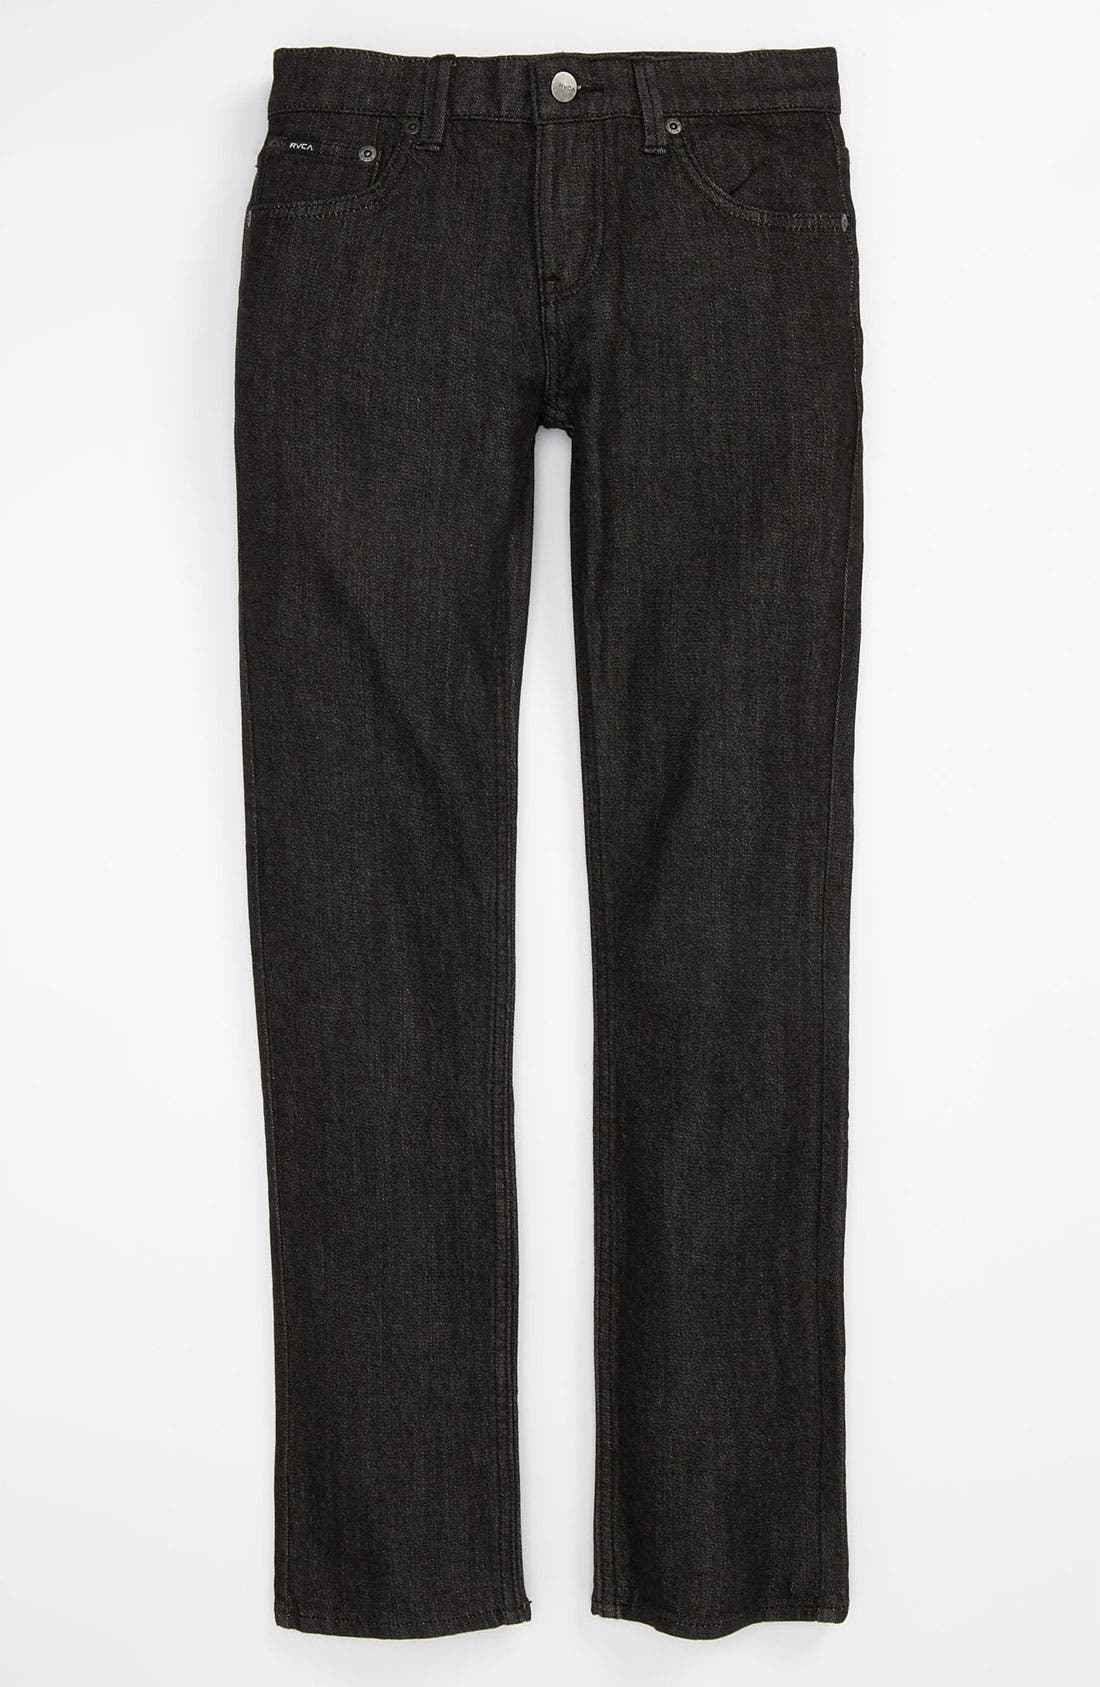 Alternate Image 2  - RVCA 'Regulars' Slim Fit Jeans (Black) (Big Boys)